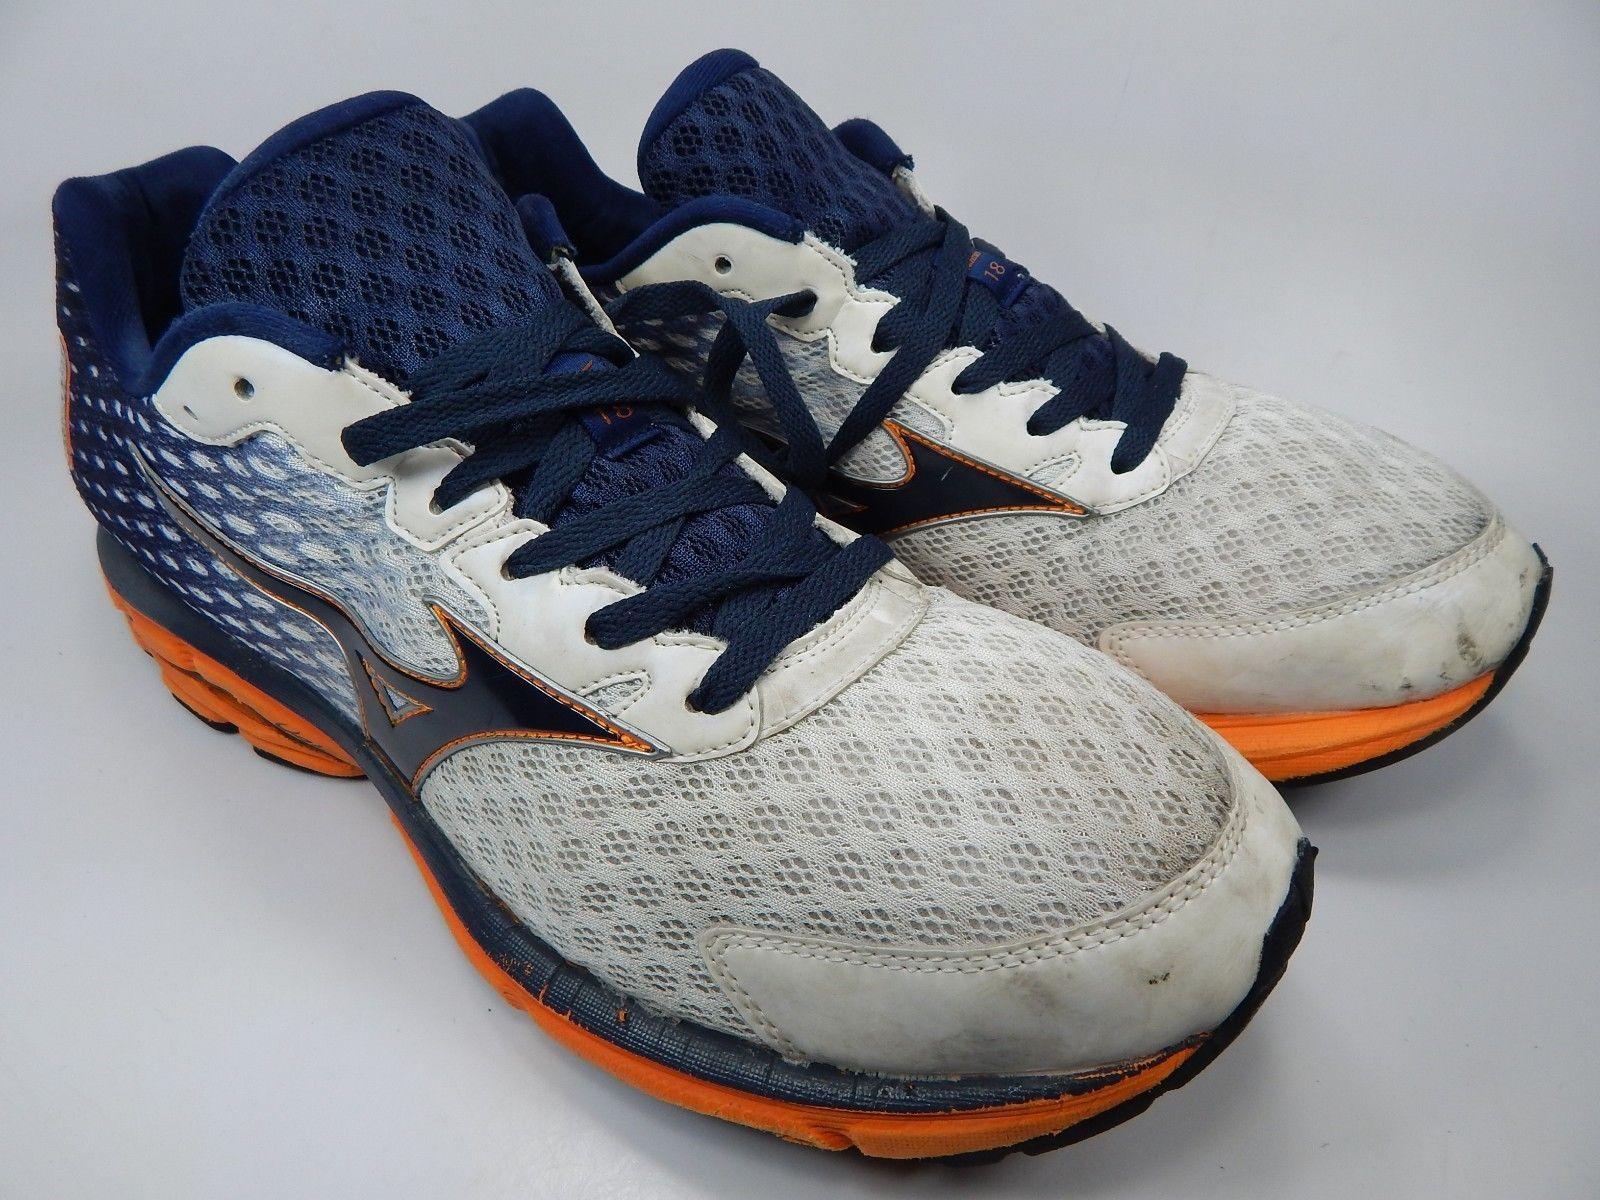 49aa30aa70c Mizuno Wave Rider 18 Running Shoes Men s Size US 14 M (D) EU 48.5